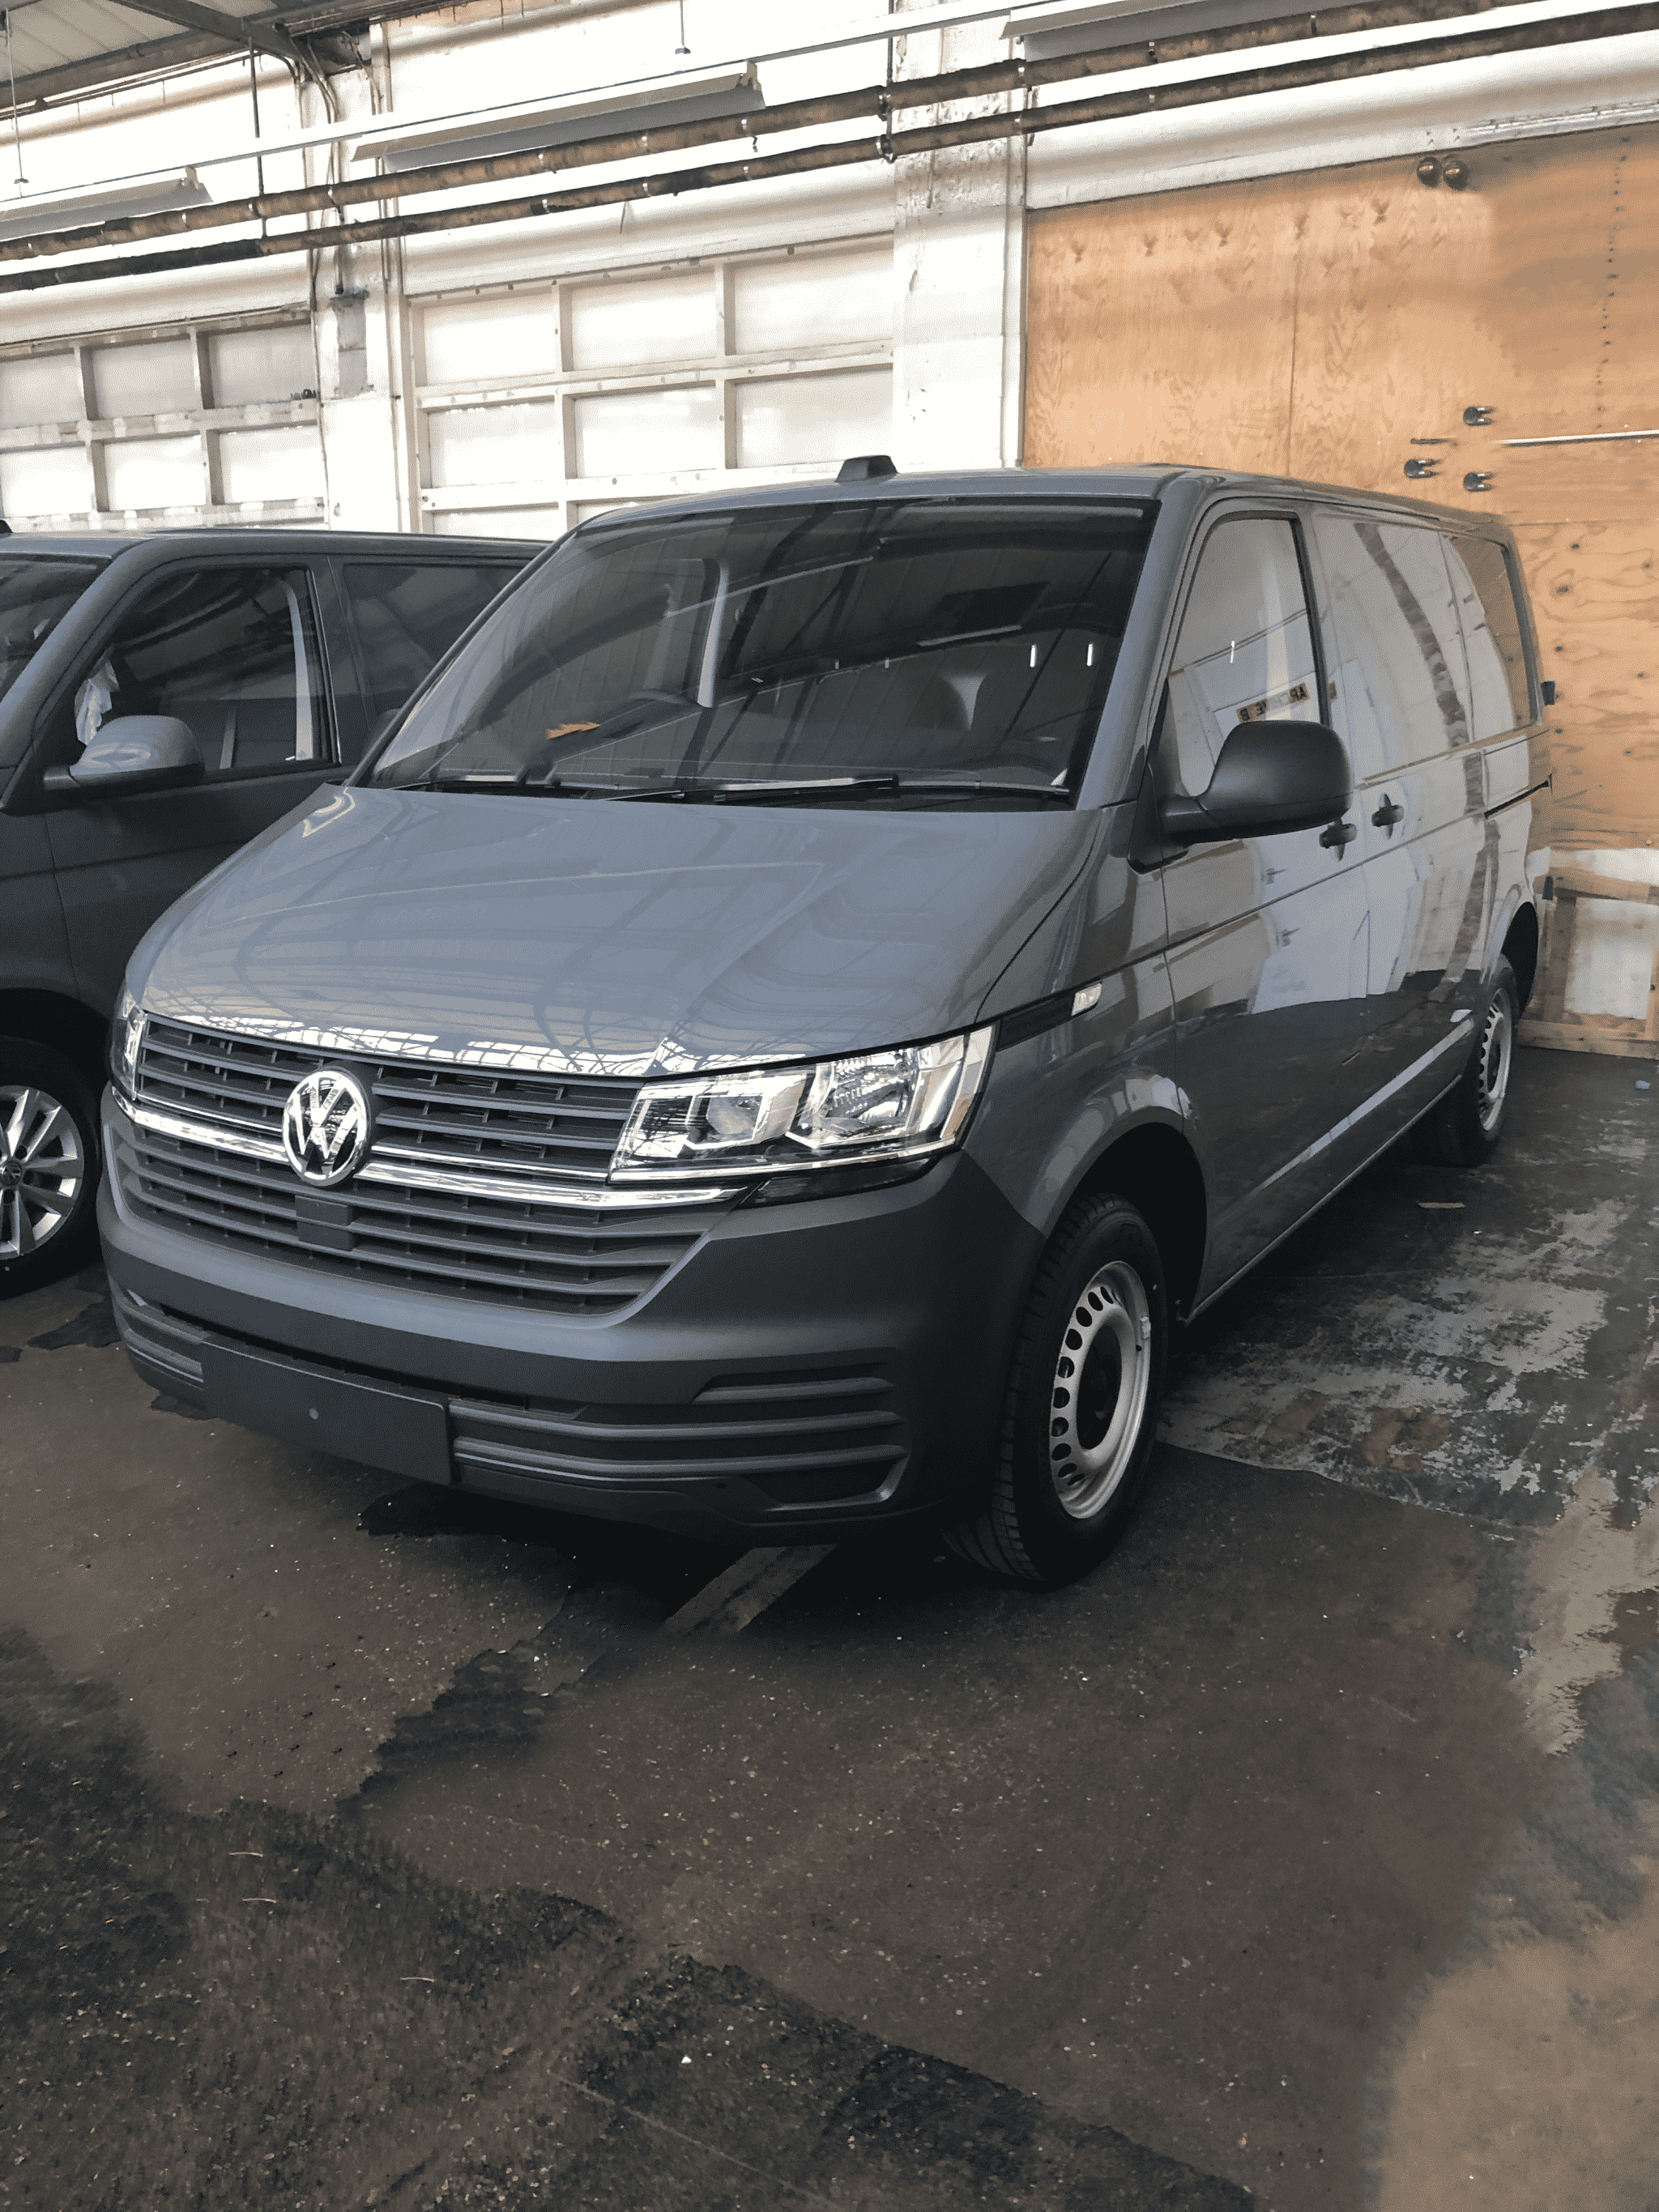 VW Transporter Kombi Pure Grey Startline 2020 Swiss Vans.